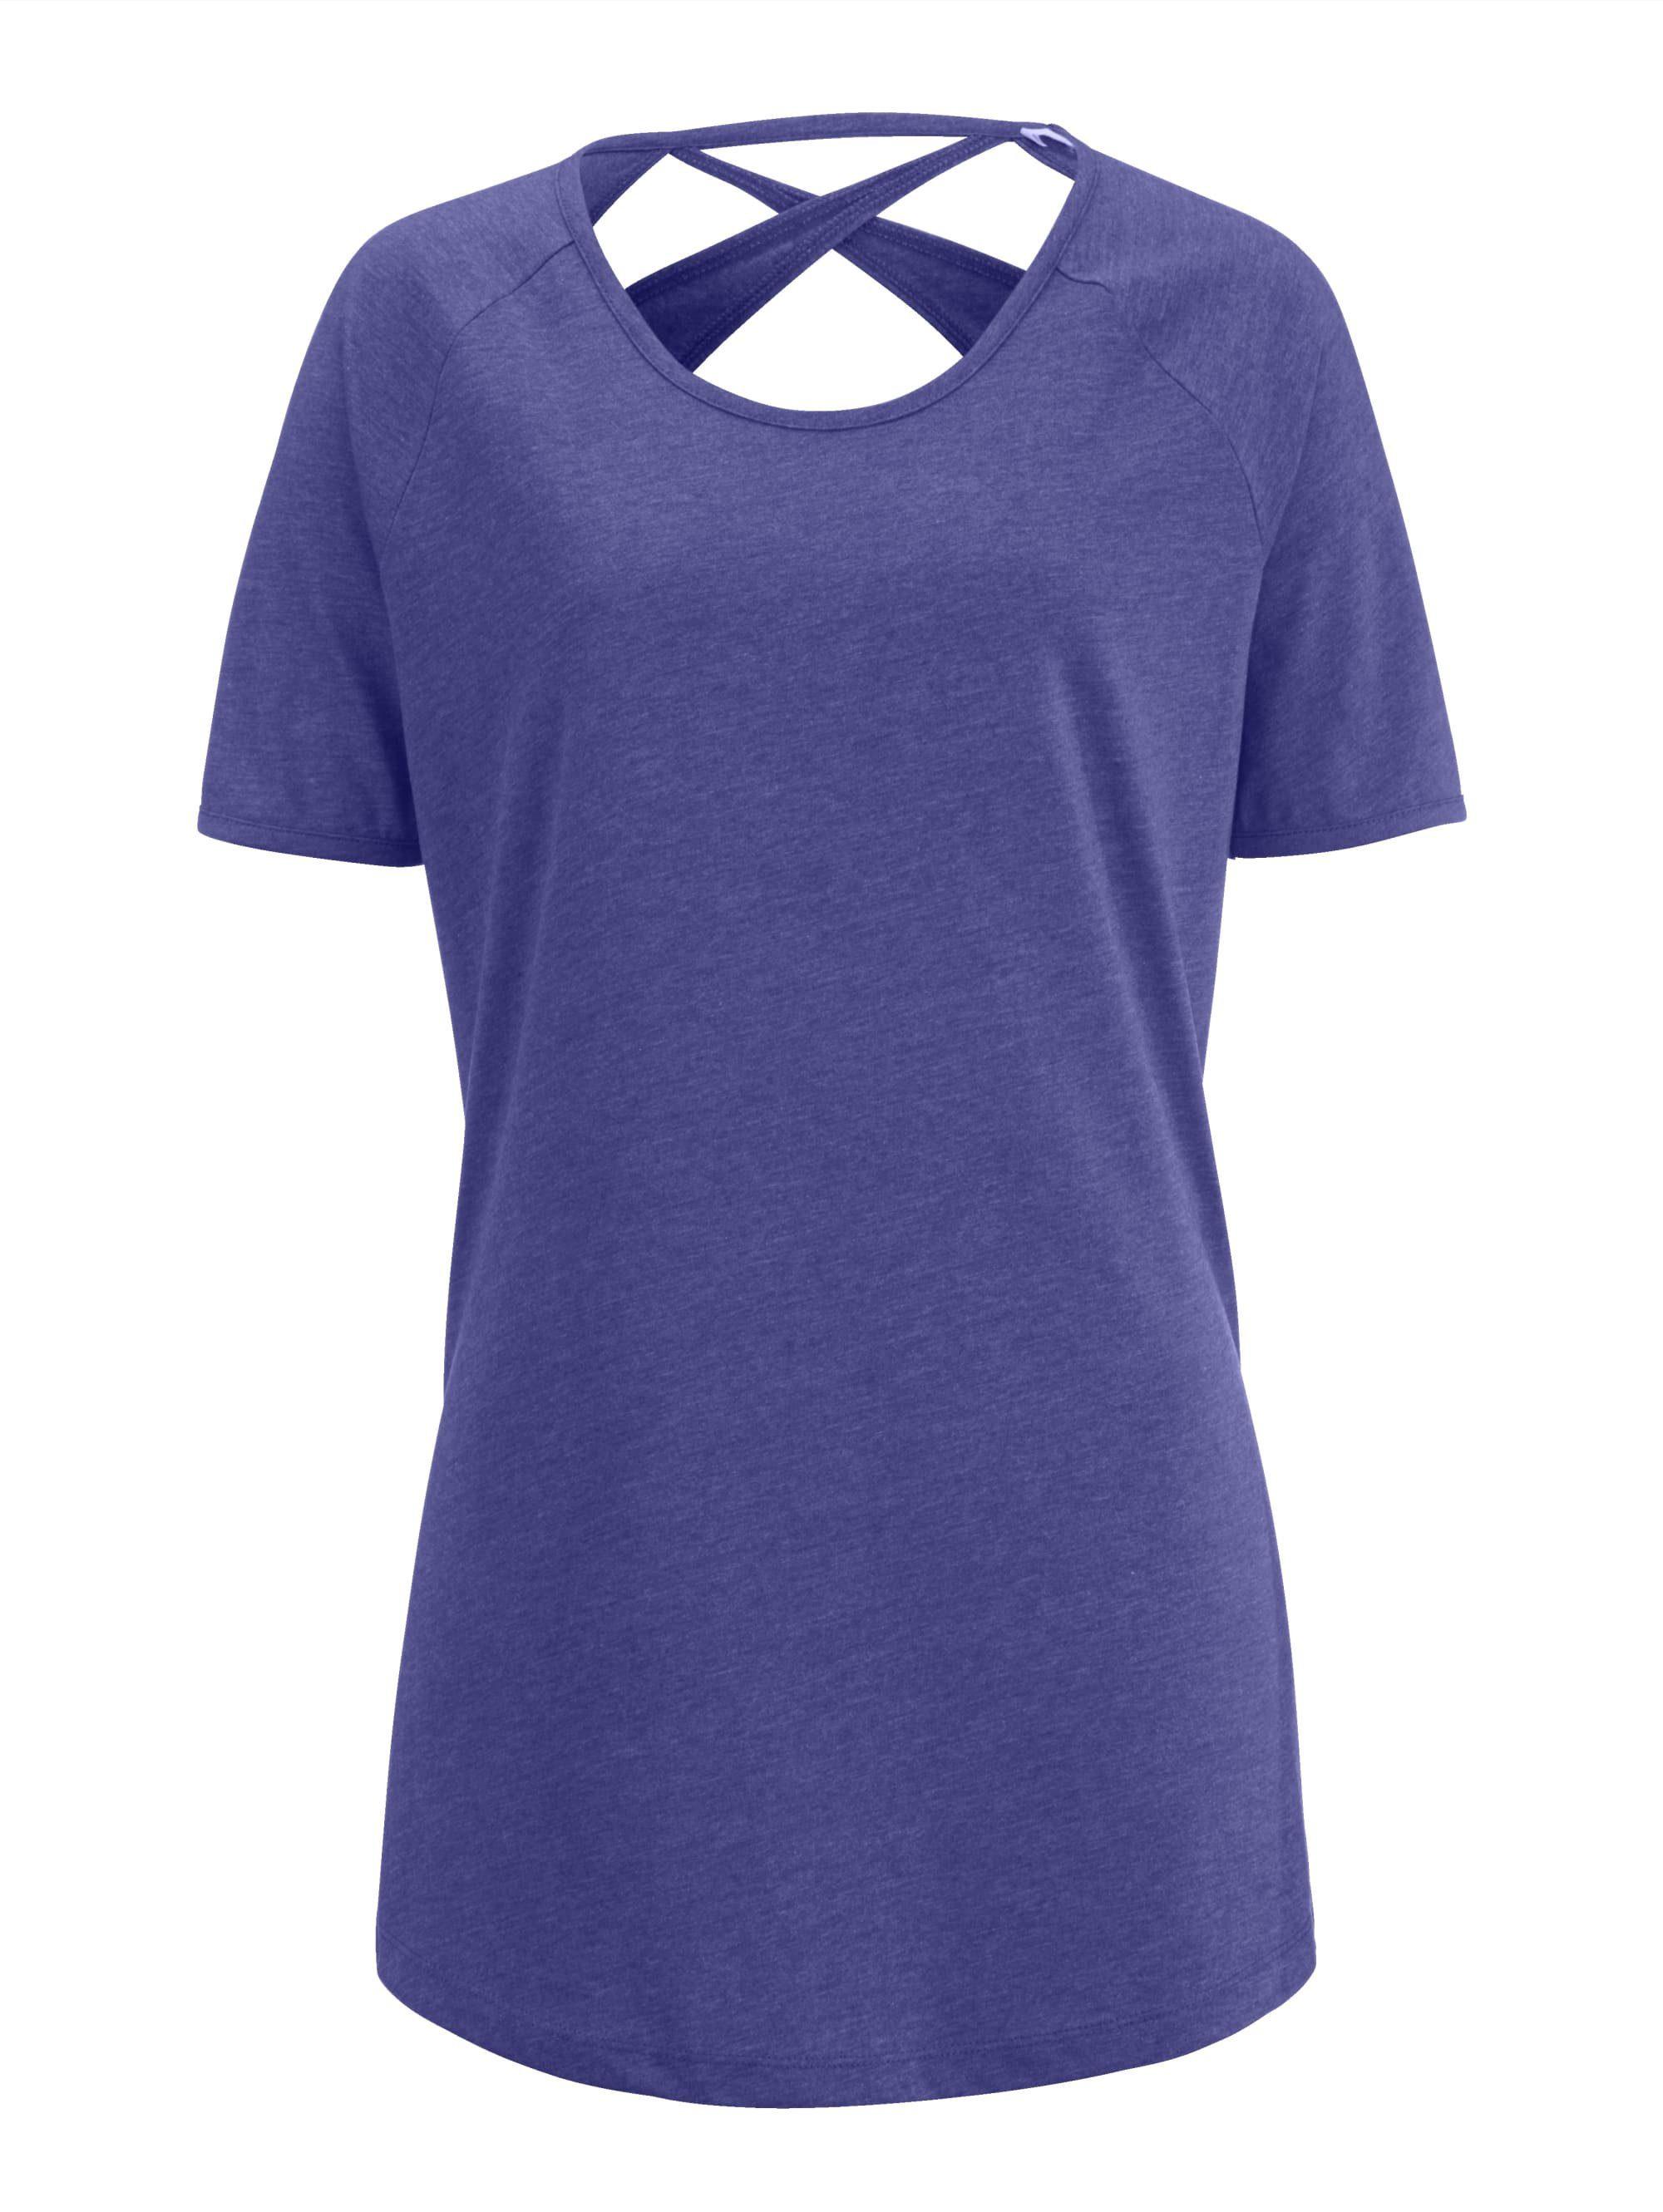 Shirt In Melange Online Moda Kaufen Alba optik TOkPZiwXu